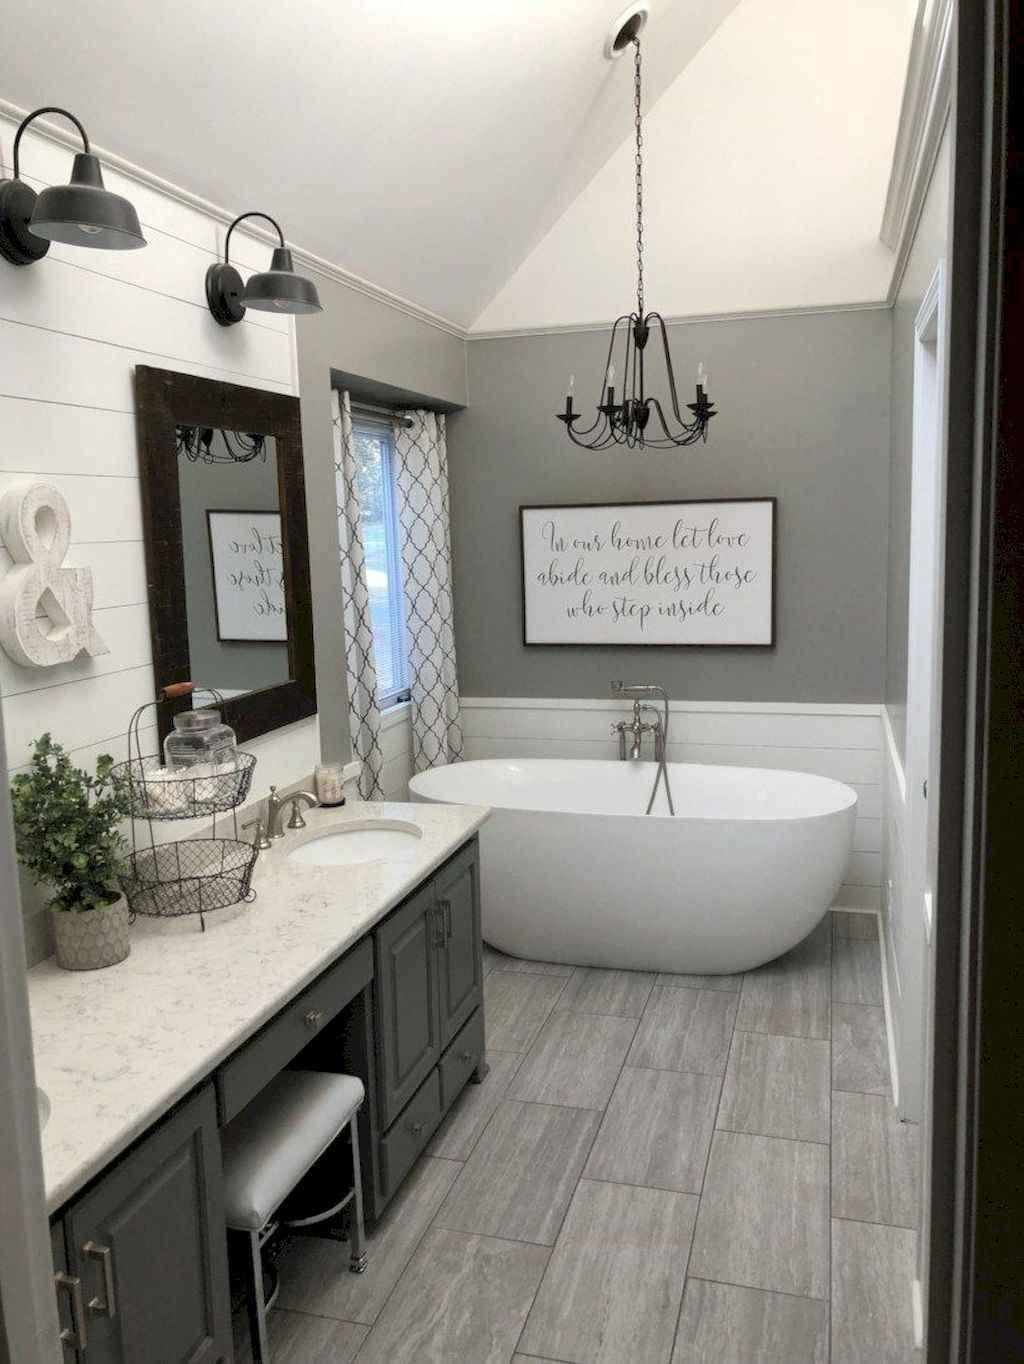 7 Inexpensive Ways To Rejuvenate Your Master Bedroom Bathroom